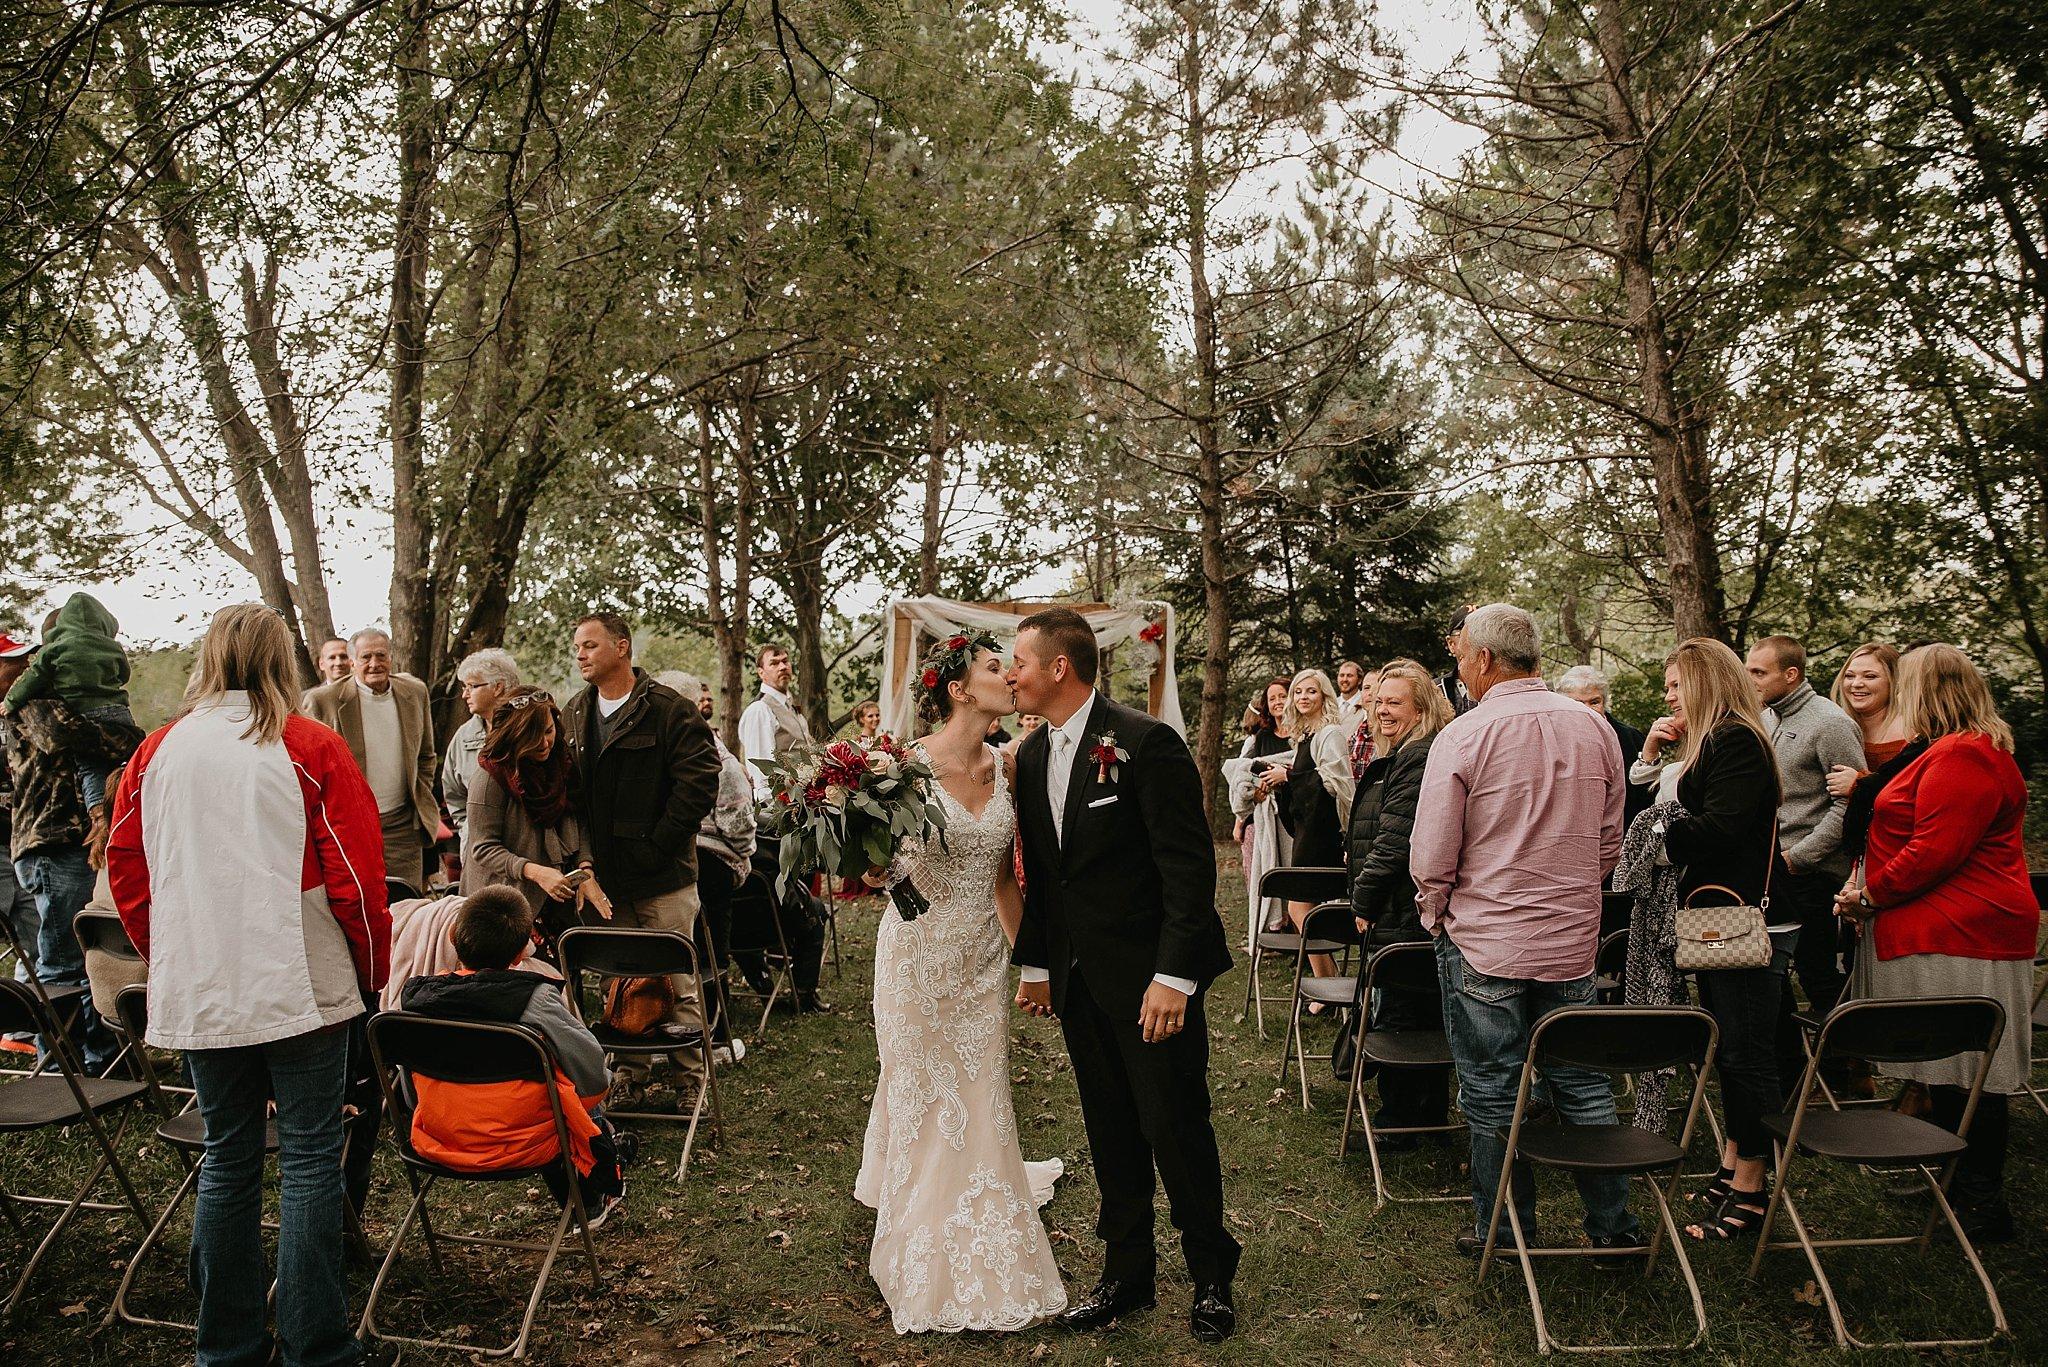 DesMoines-Iowa-Wedding-Photography-Destination-Photographer_0134.jpg